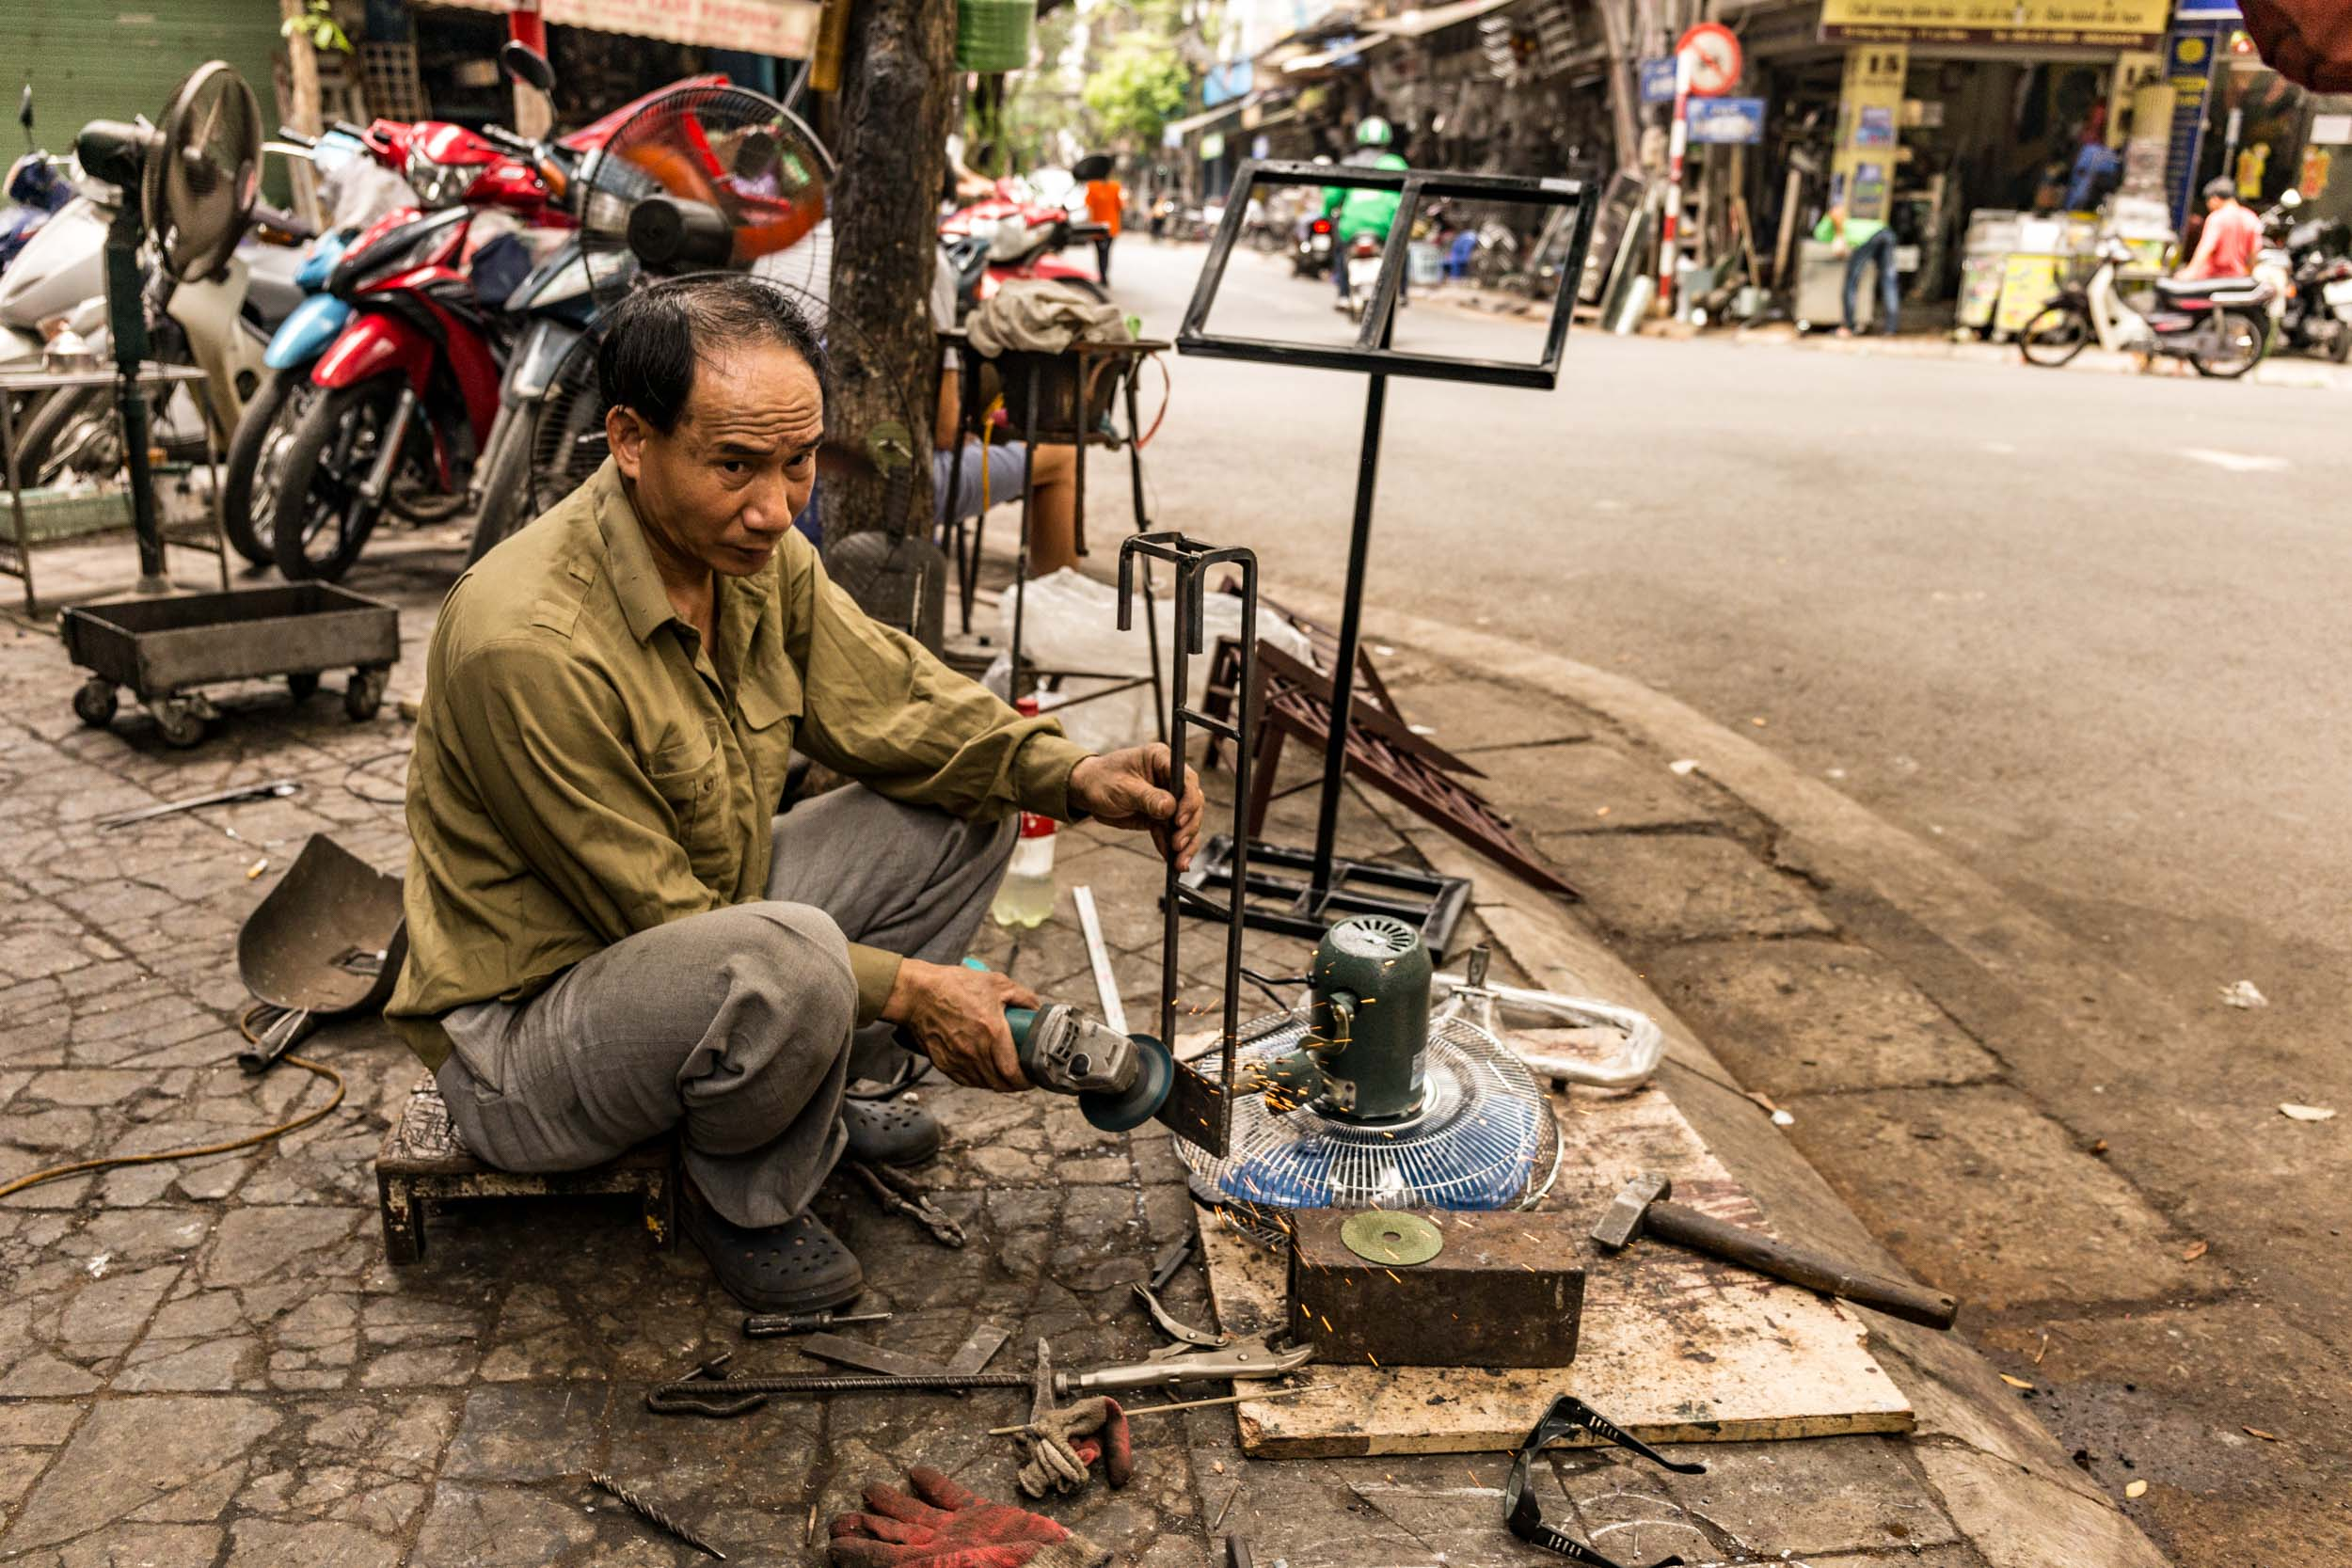 Steel worker grinding away on streets of hanoi.